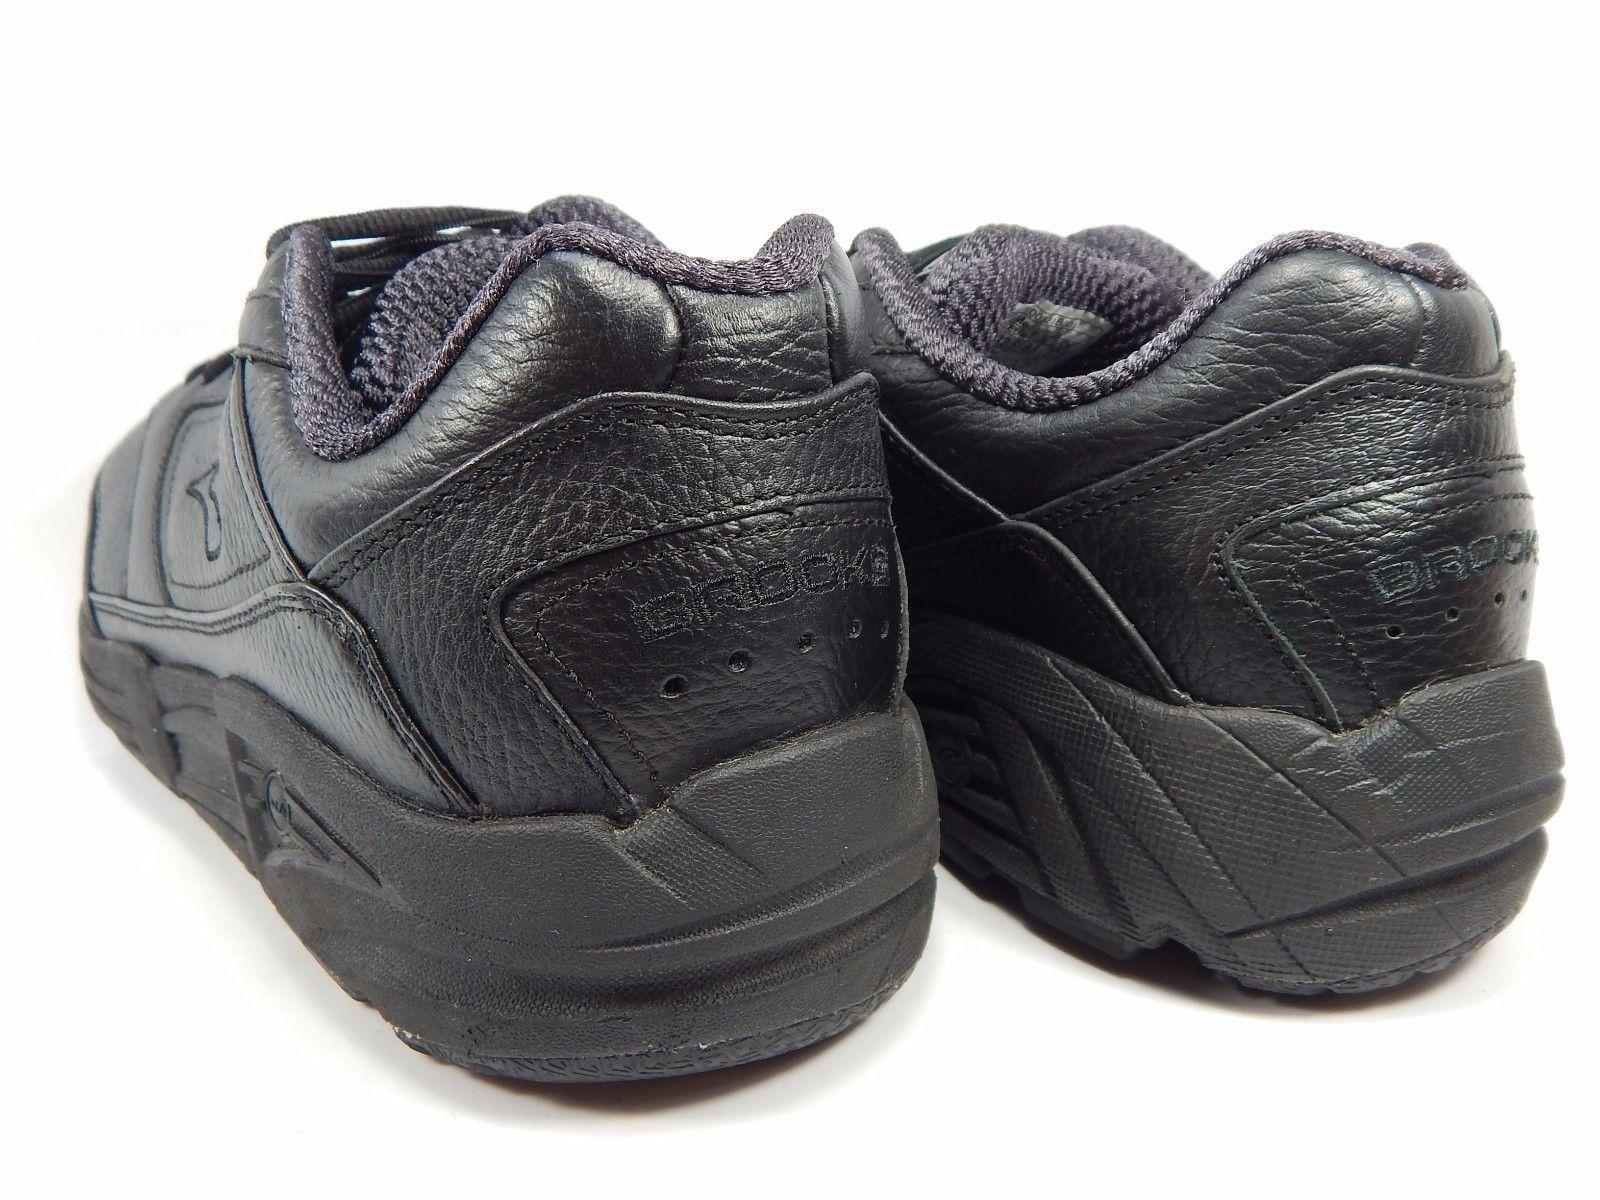 MISMATCH Brooks Addiction Walker Women's Shoes Size 11.5 B Left & 10.5 B Right